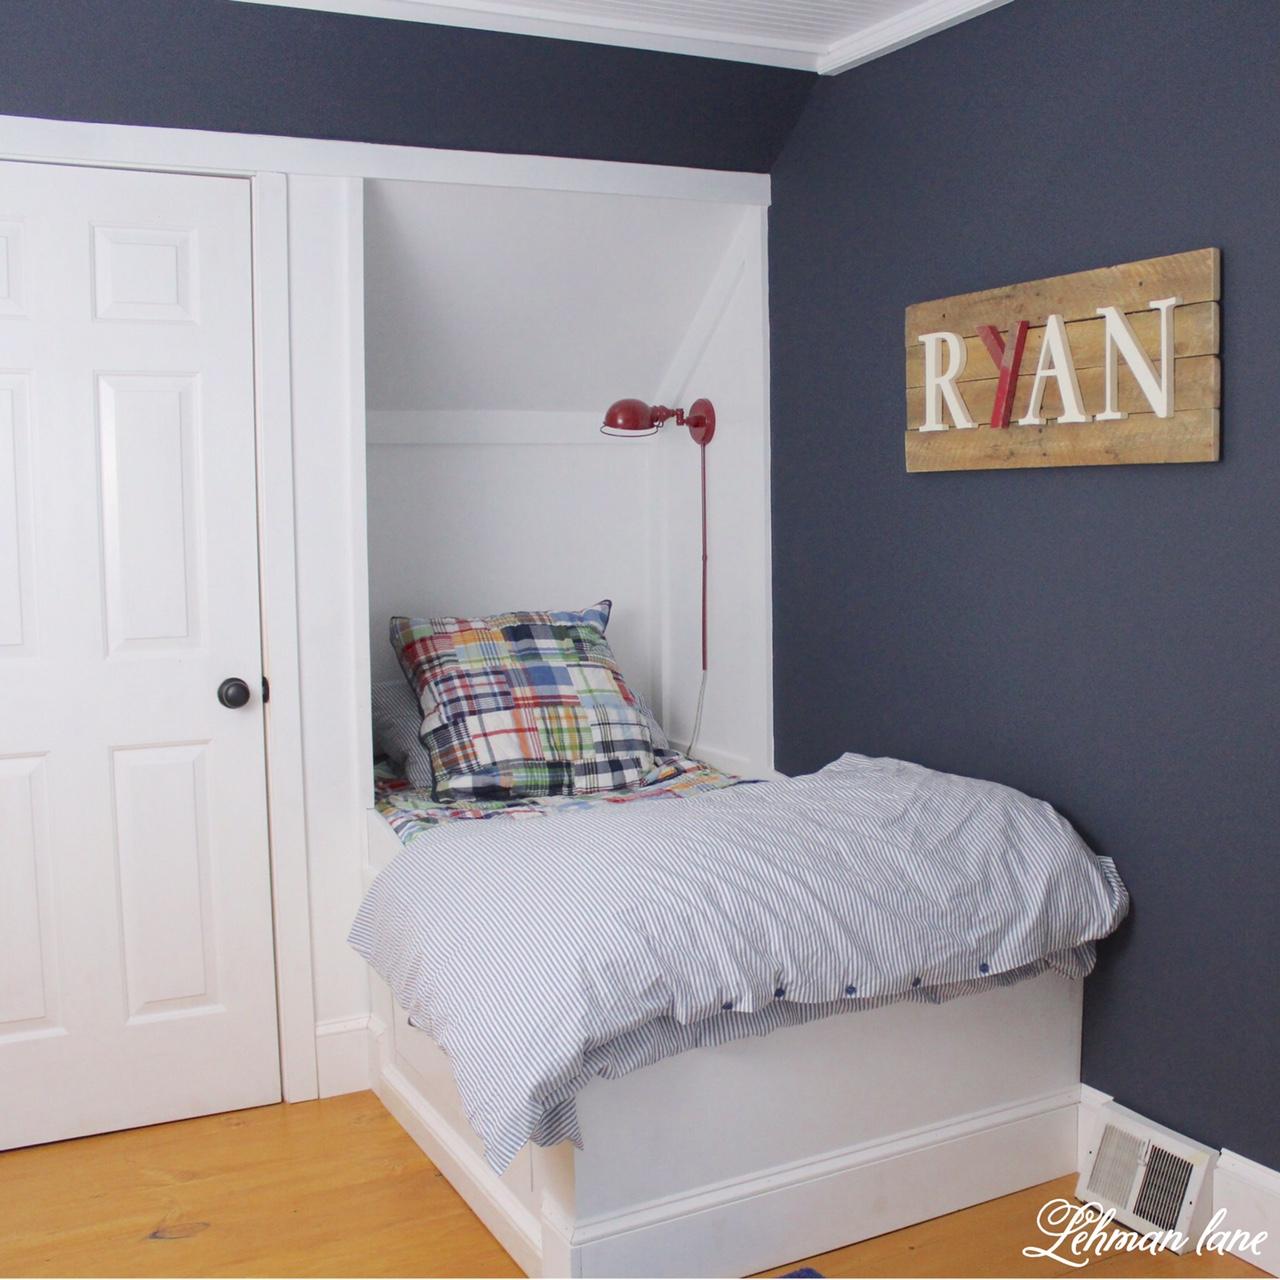 Final Reveal - Boys Farmhouse Bedroom, Built in bed, dresser, bead board ceiling, wide pine floors, Benjamin Moore Hale Navy walls, and an angled door